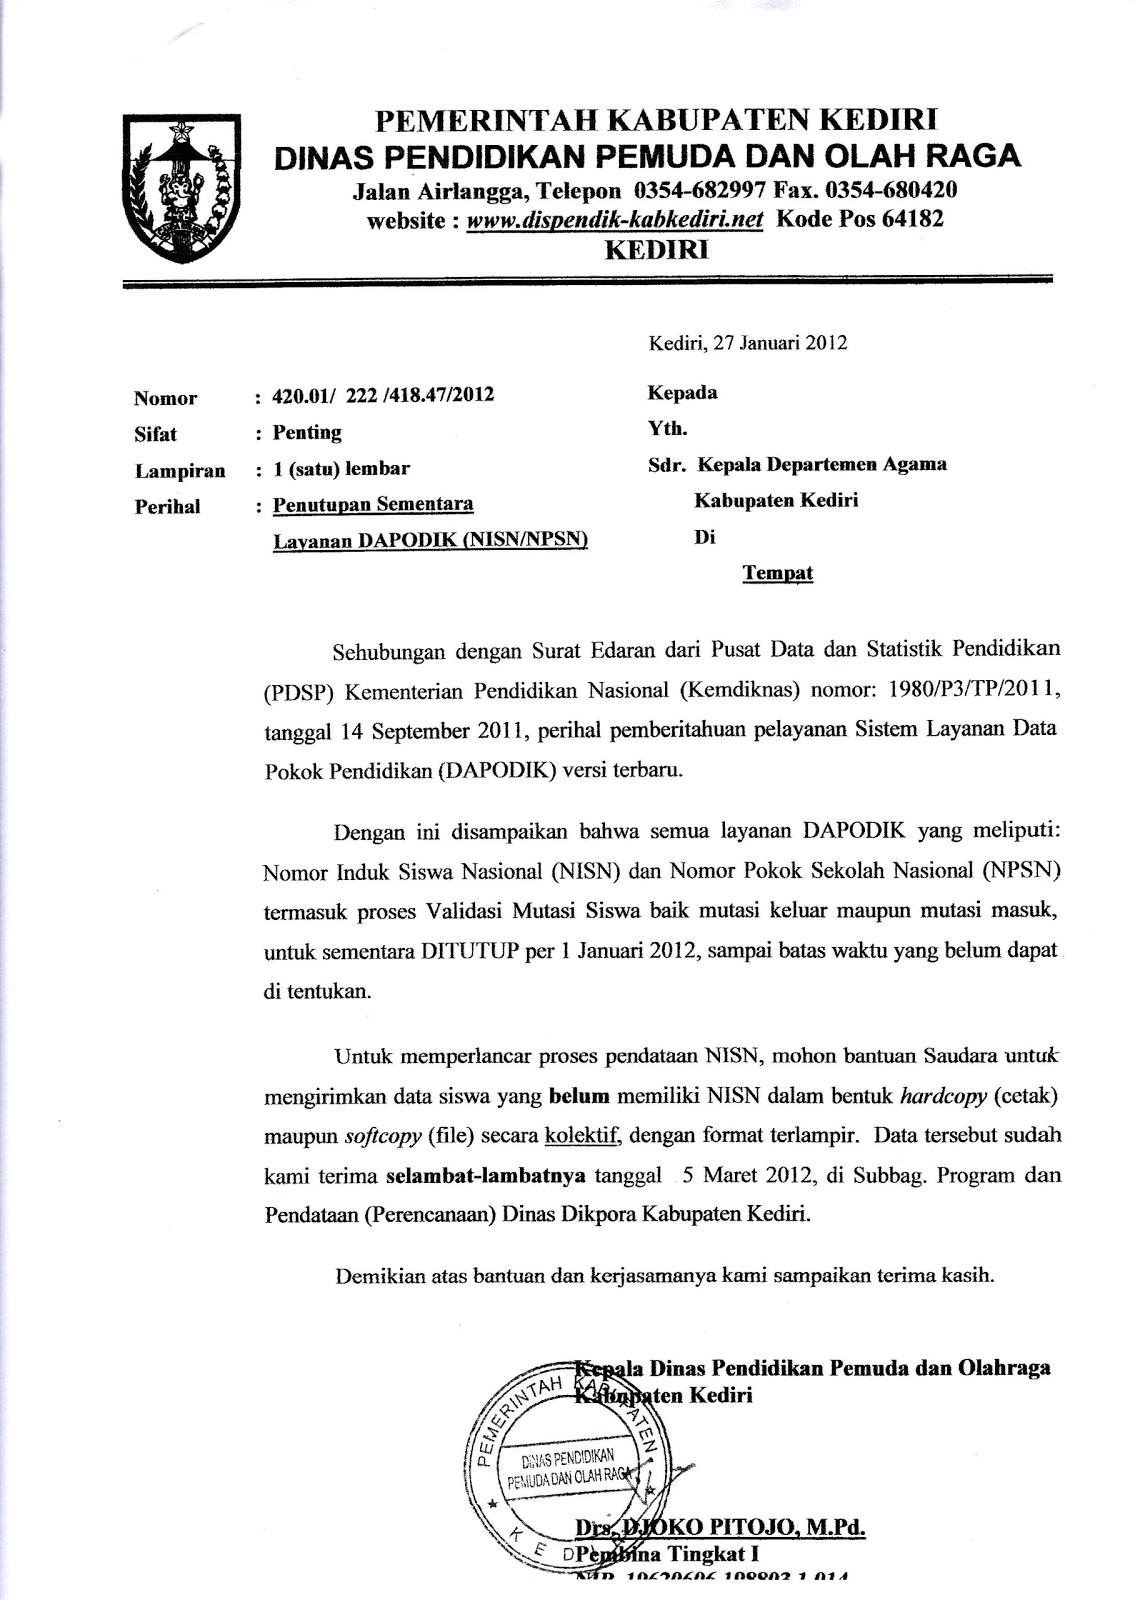 Peduli Madrasah Indonesia Surat Edaran Tentang Nisn Dari Disdikpora